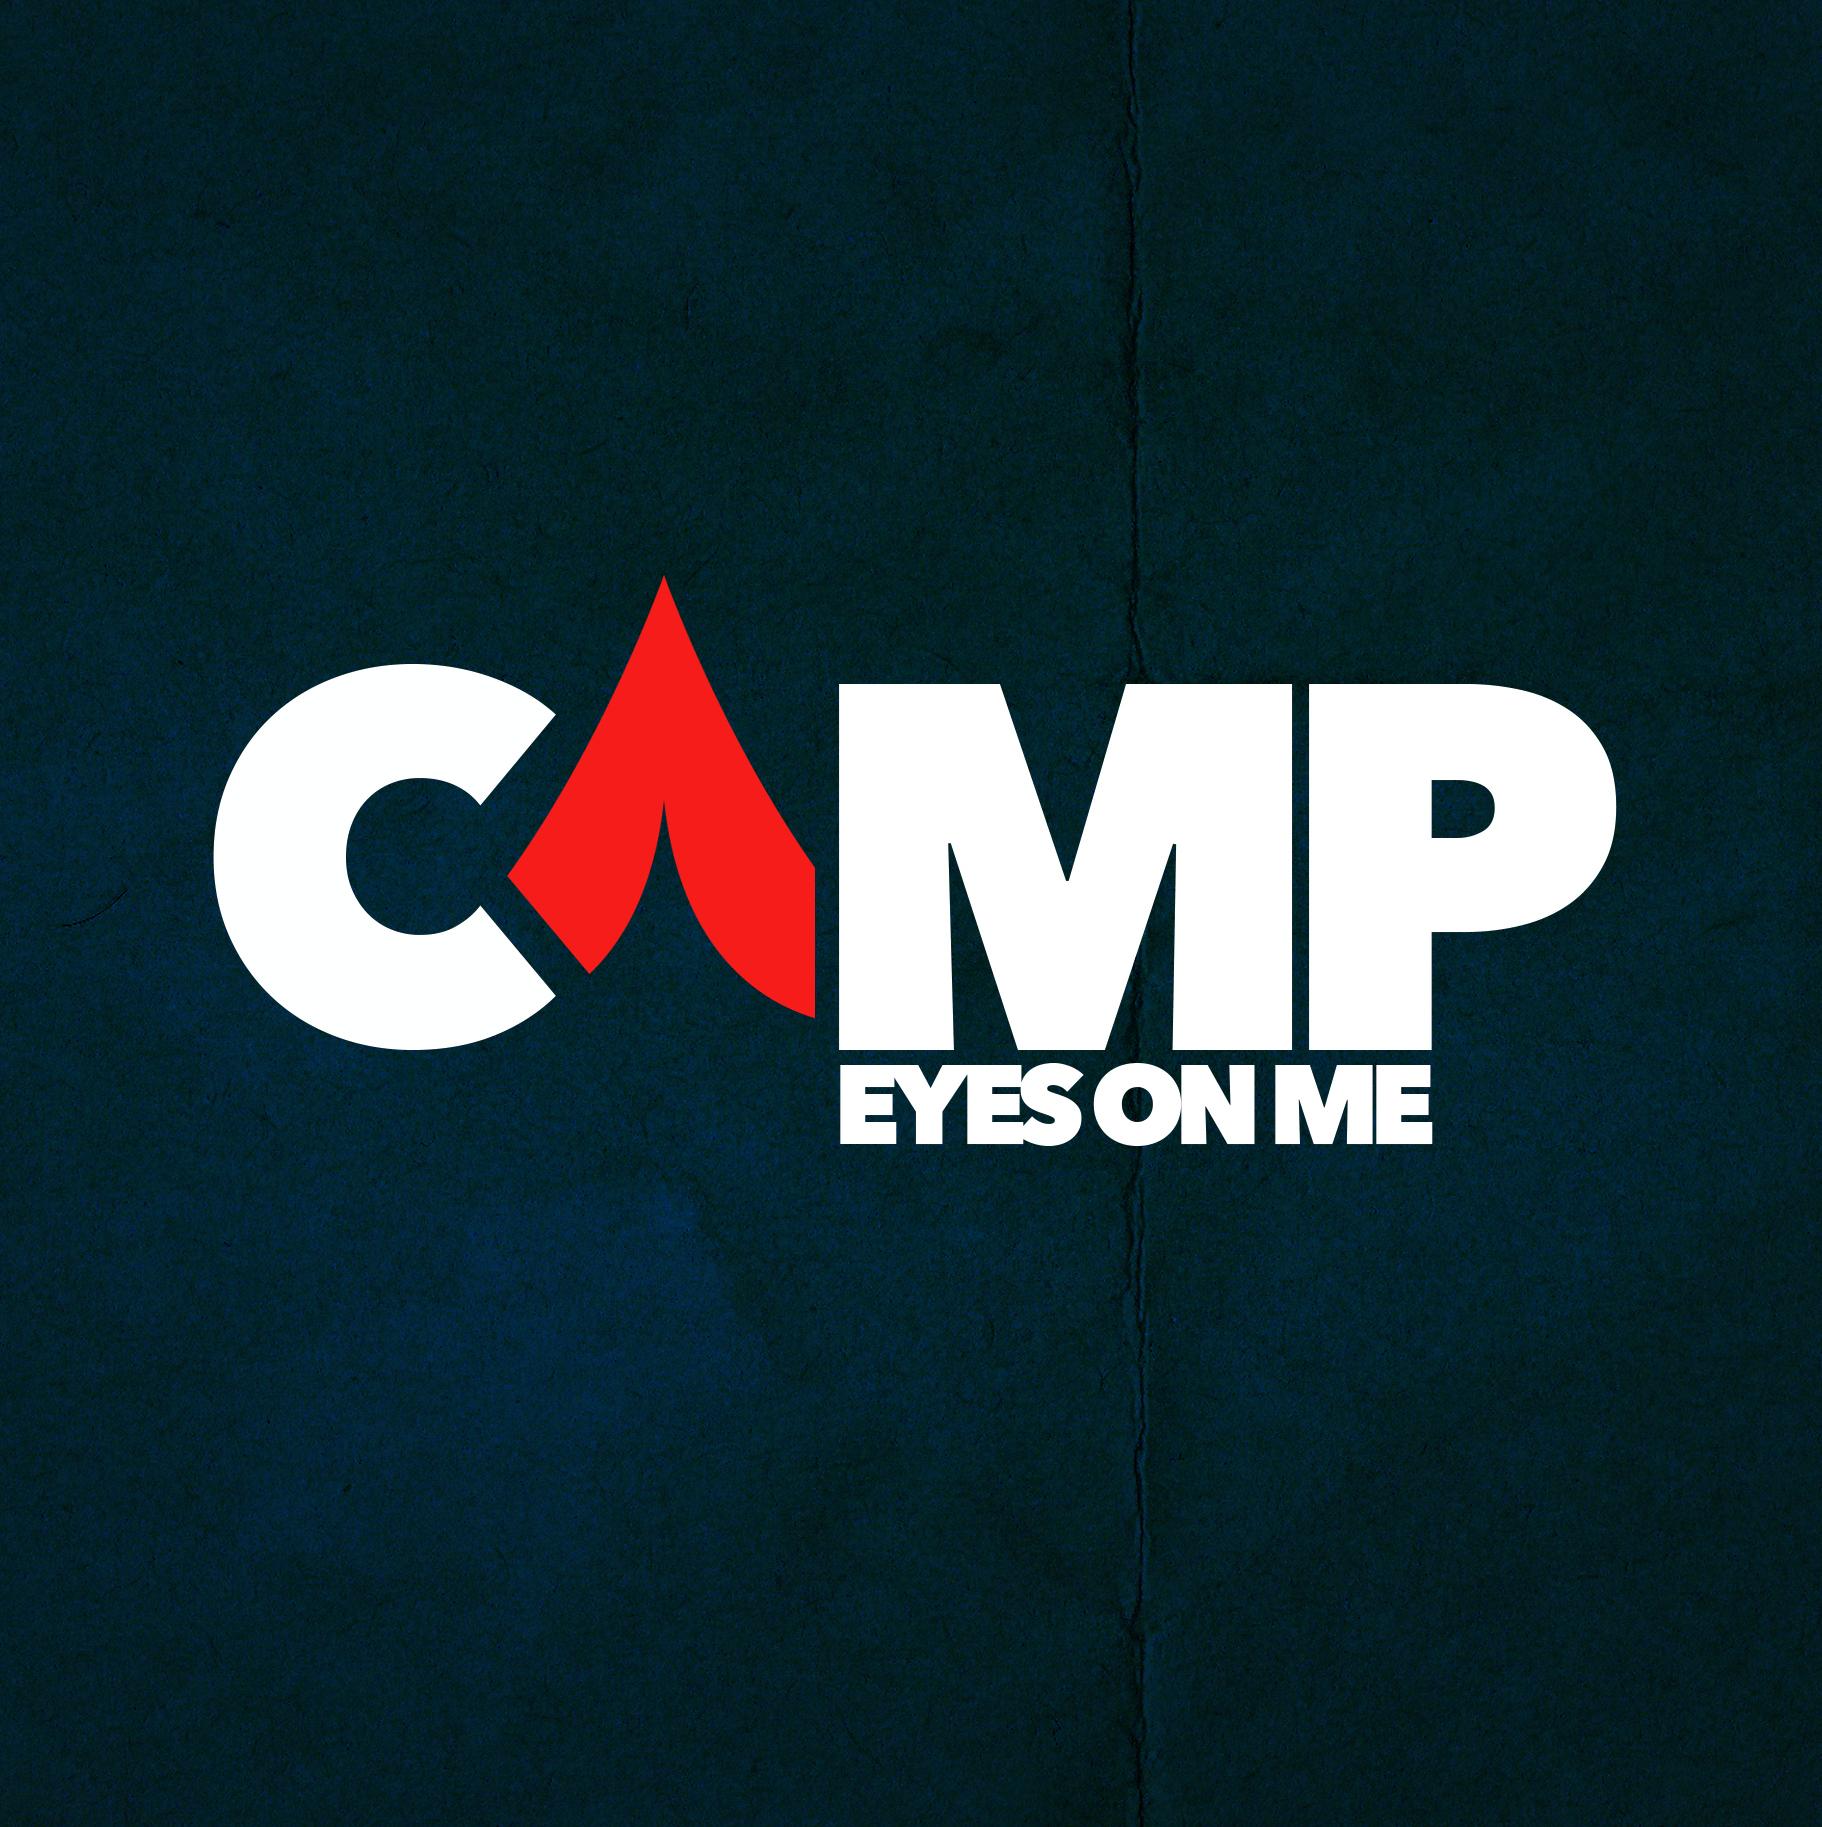 CAMP_EOM_SQUARE.jpg